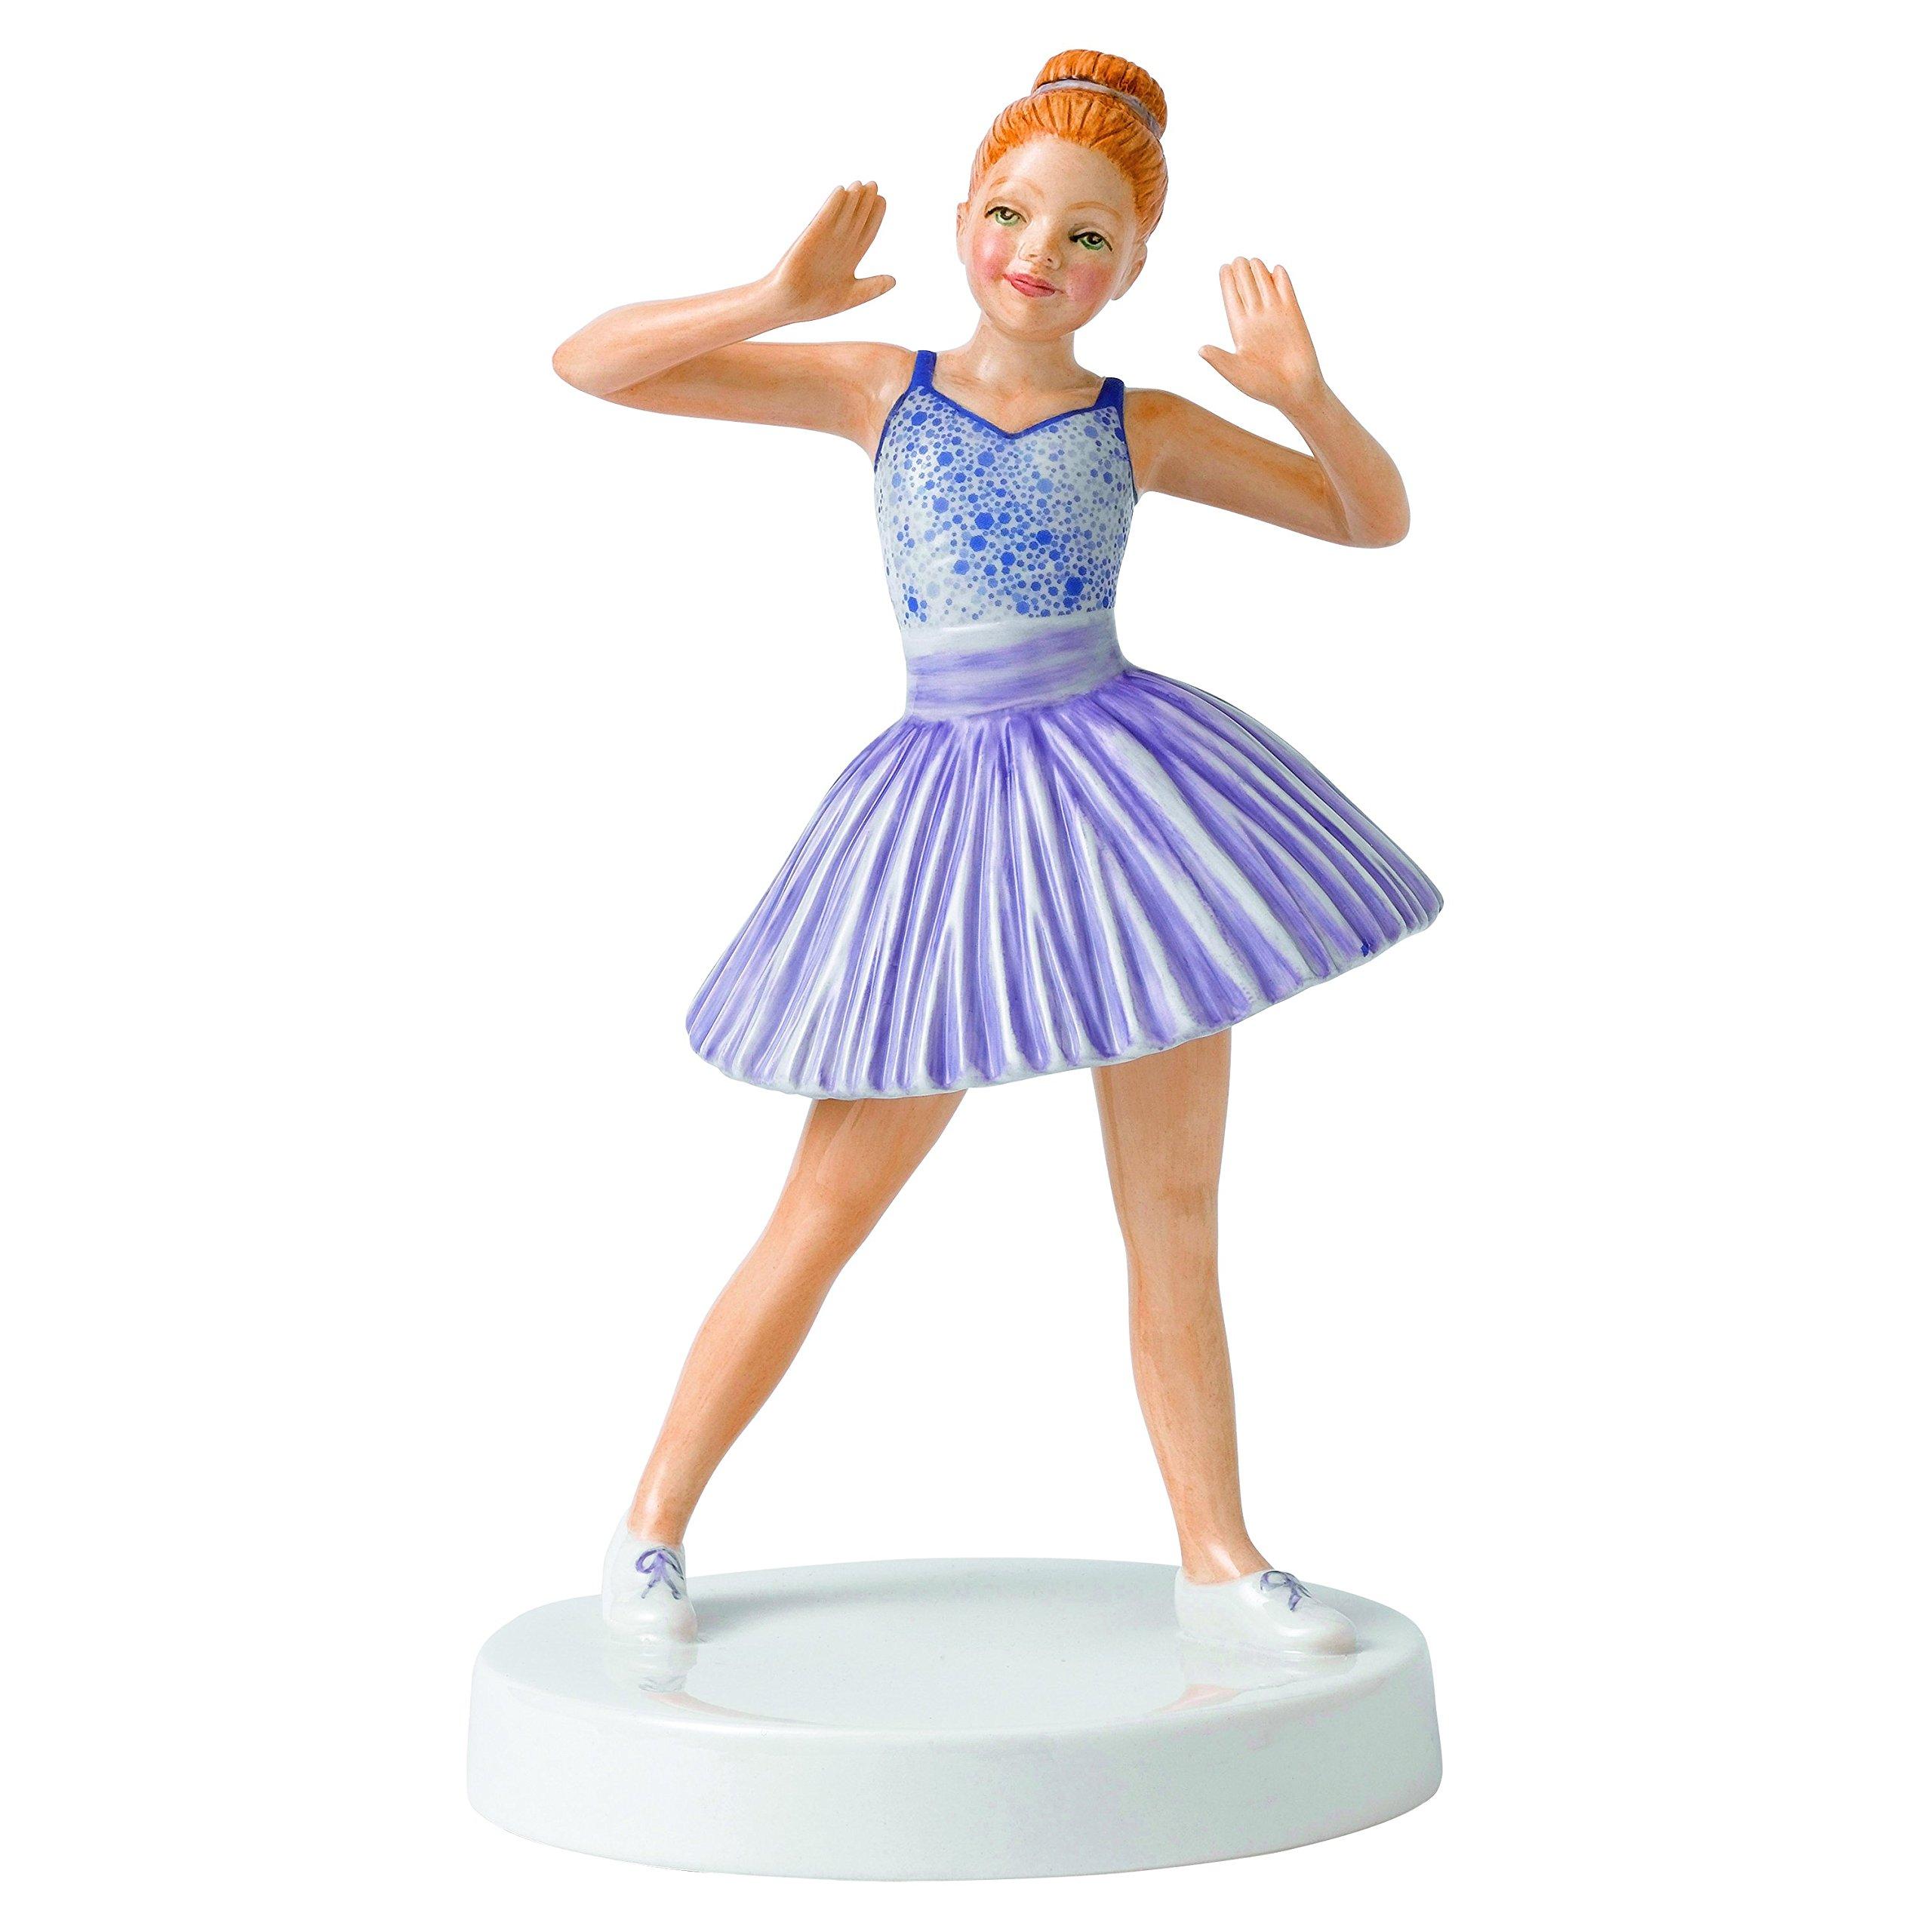 Royal Doulton Rhythm and Dance Jazz Dancer Figurine